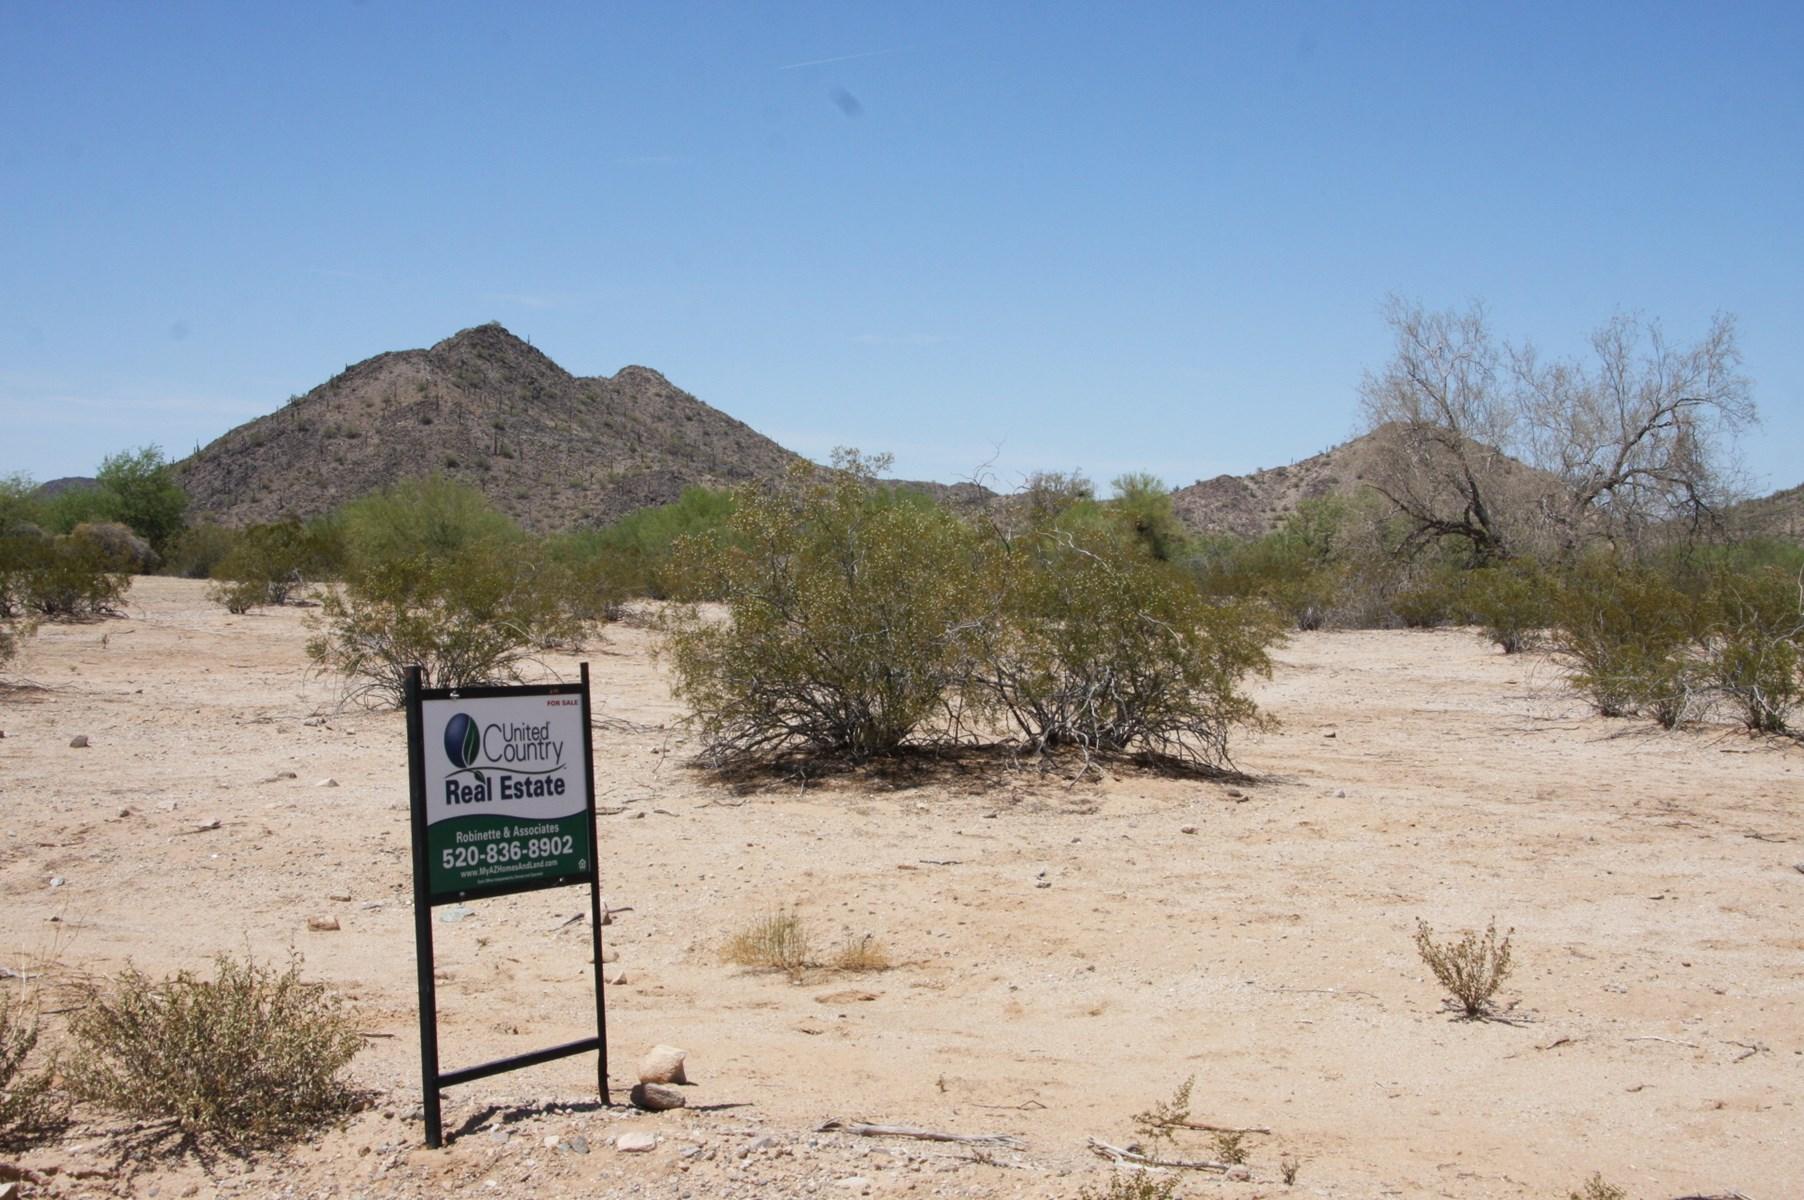 Land For Sale Maricopa Az, Acres For Sale Arizona